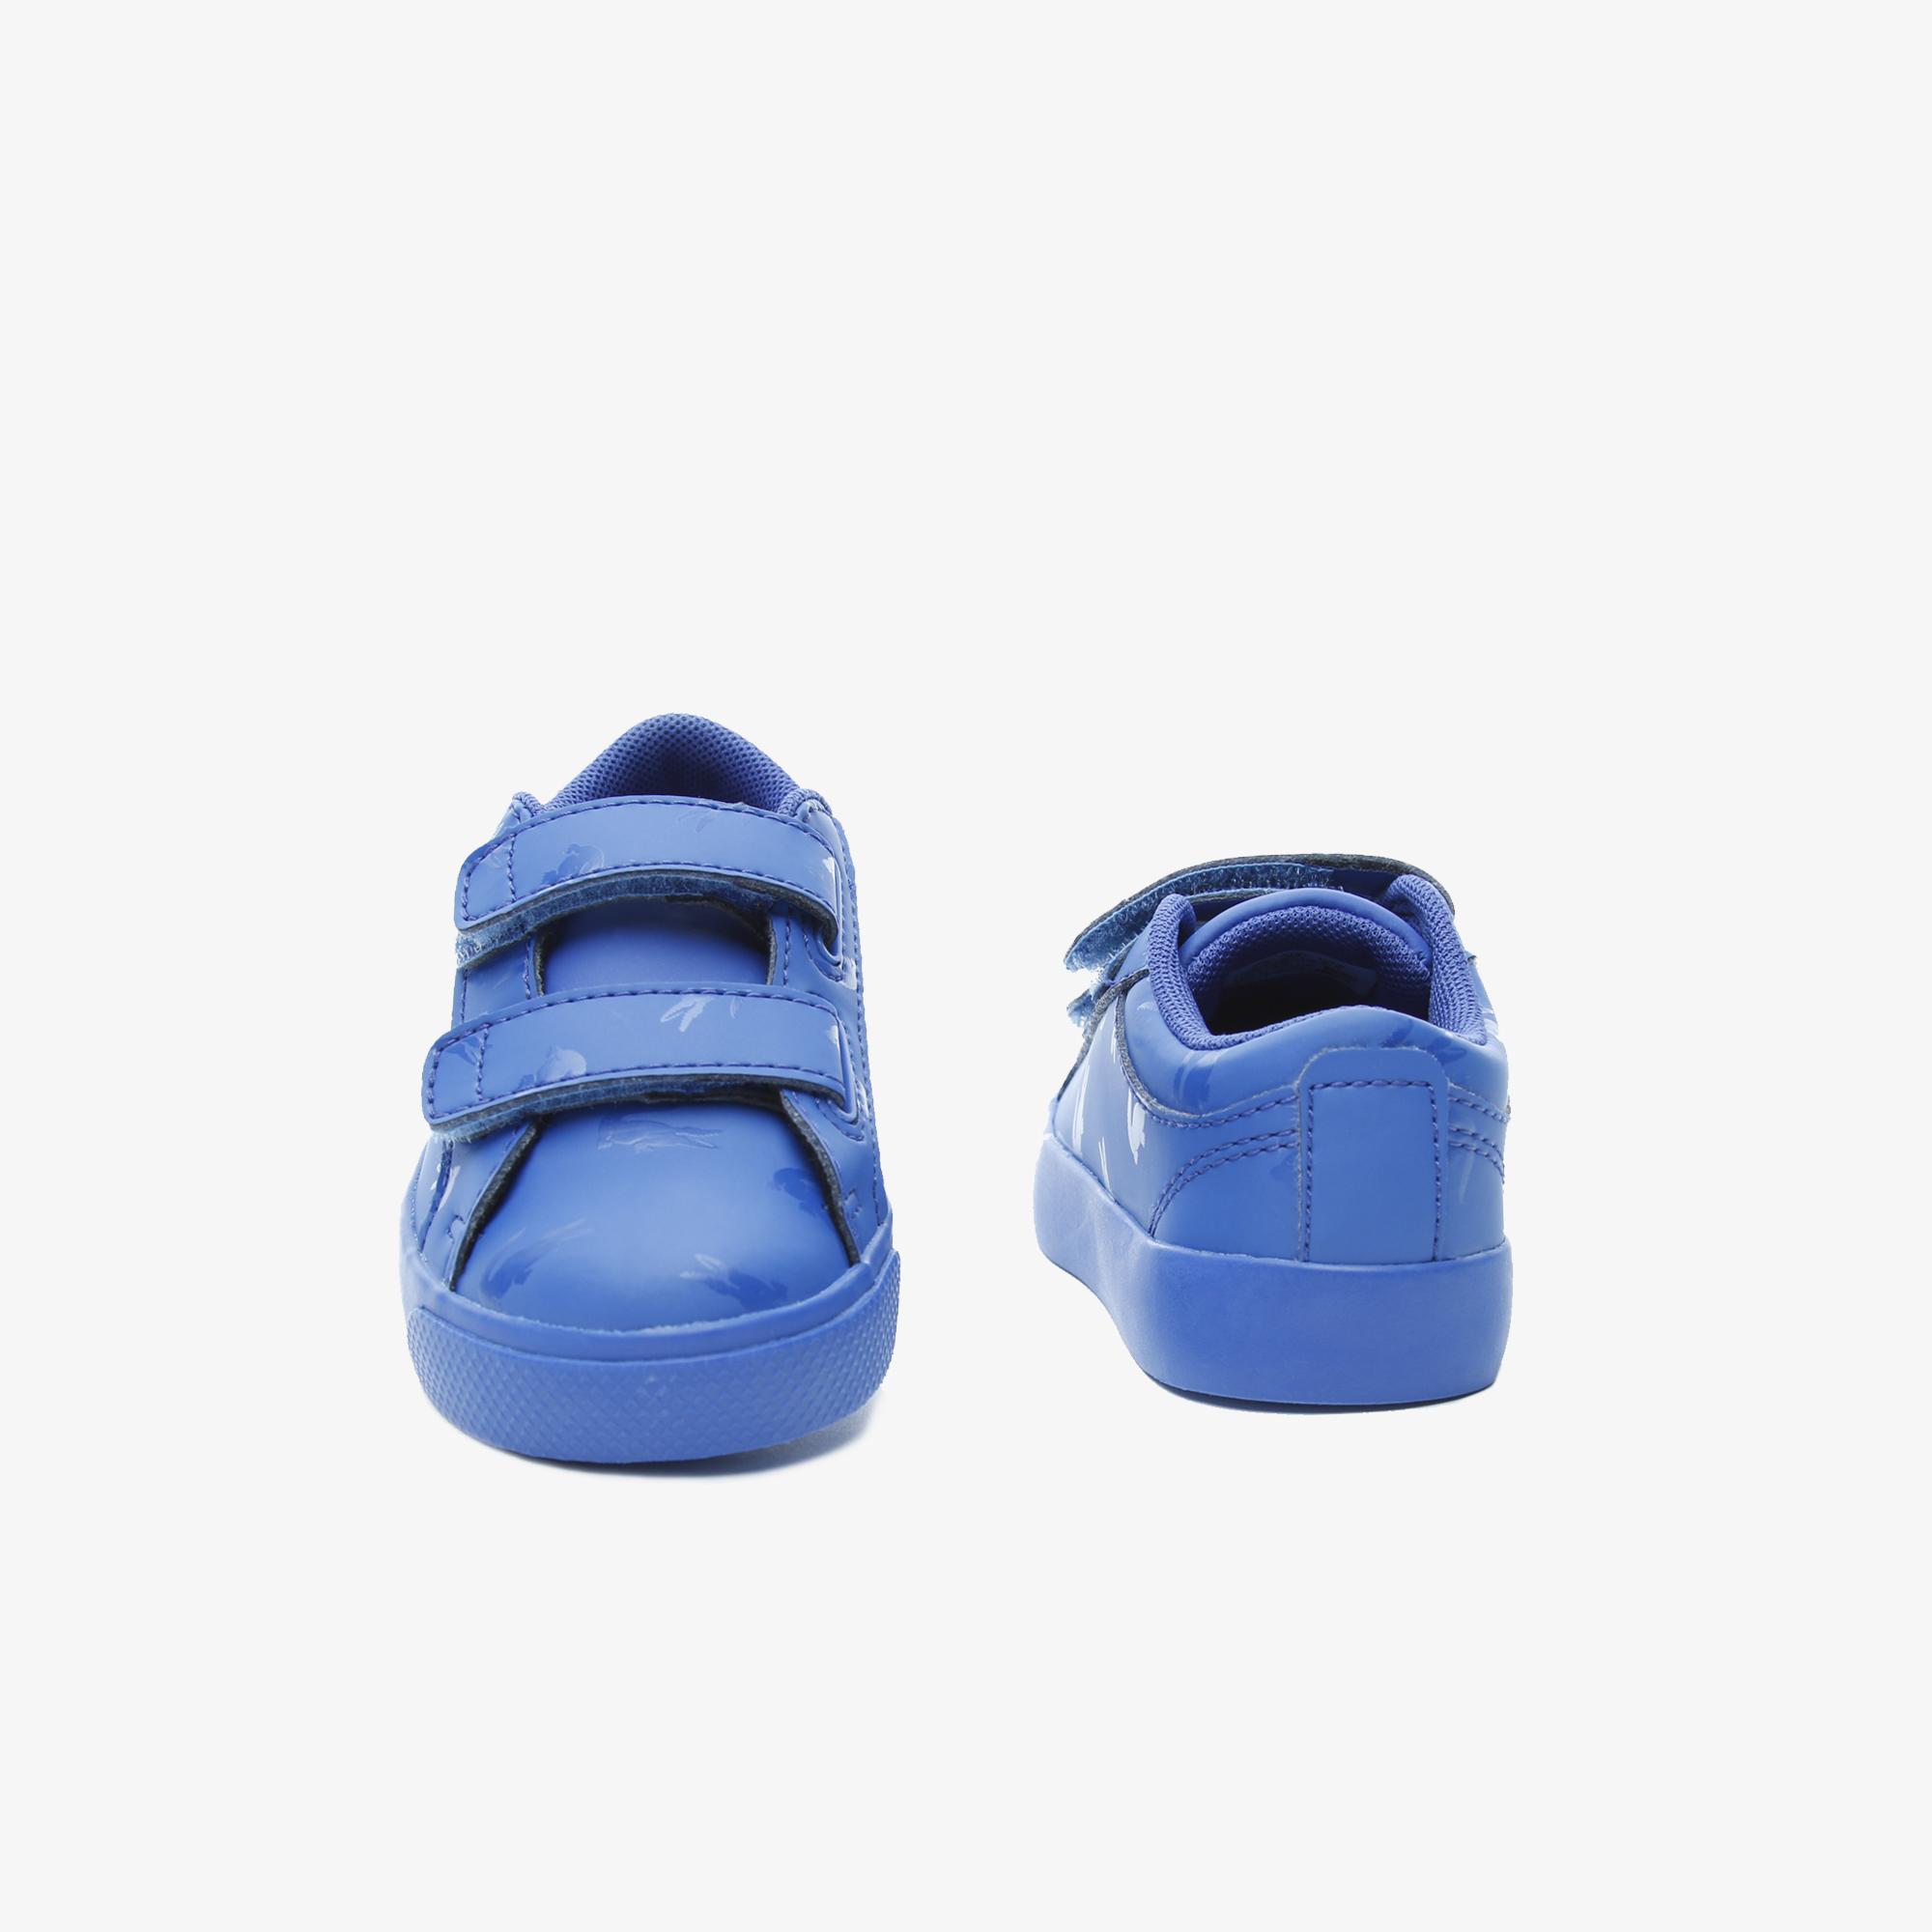 Lacoste Straightset 319 2 Cui Çocuk Mavi - Mavi Casual Ayakkabı